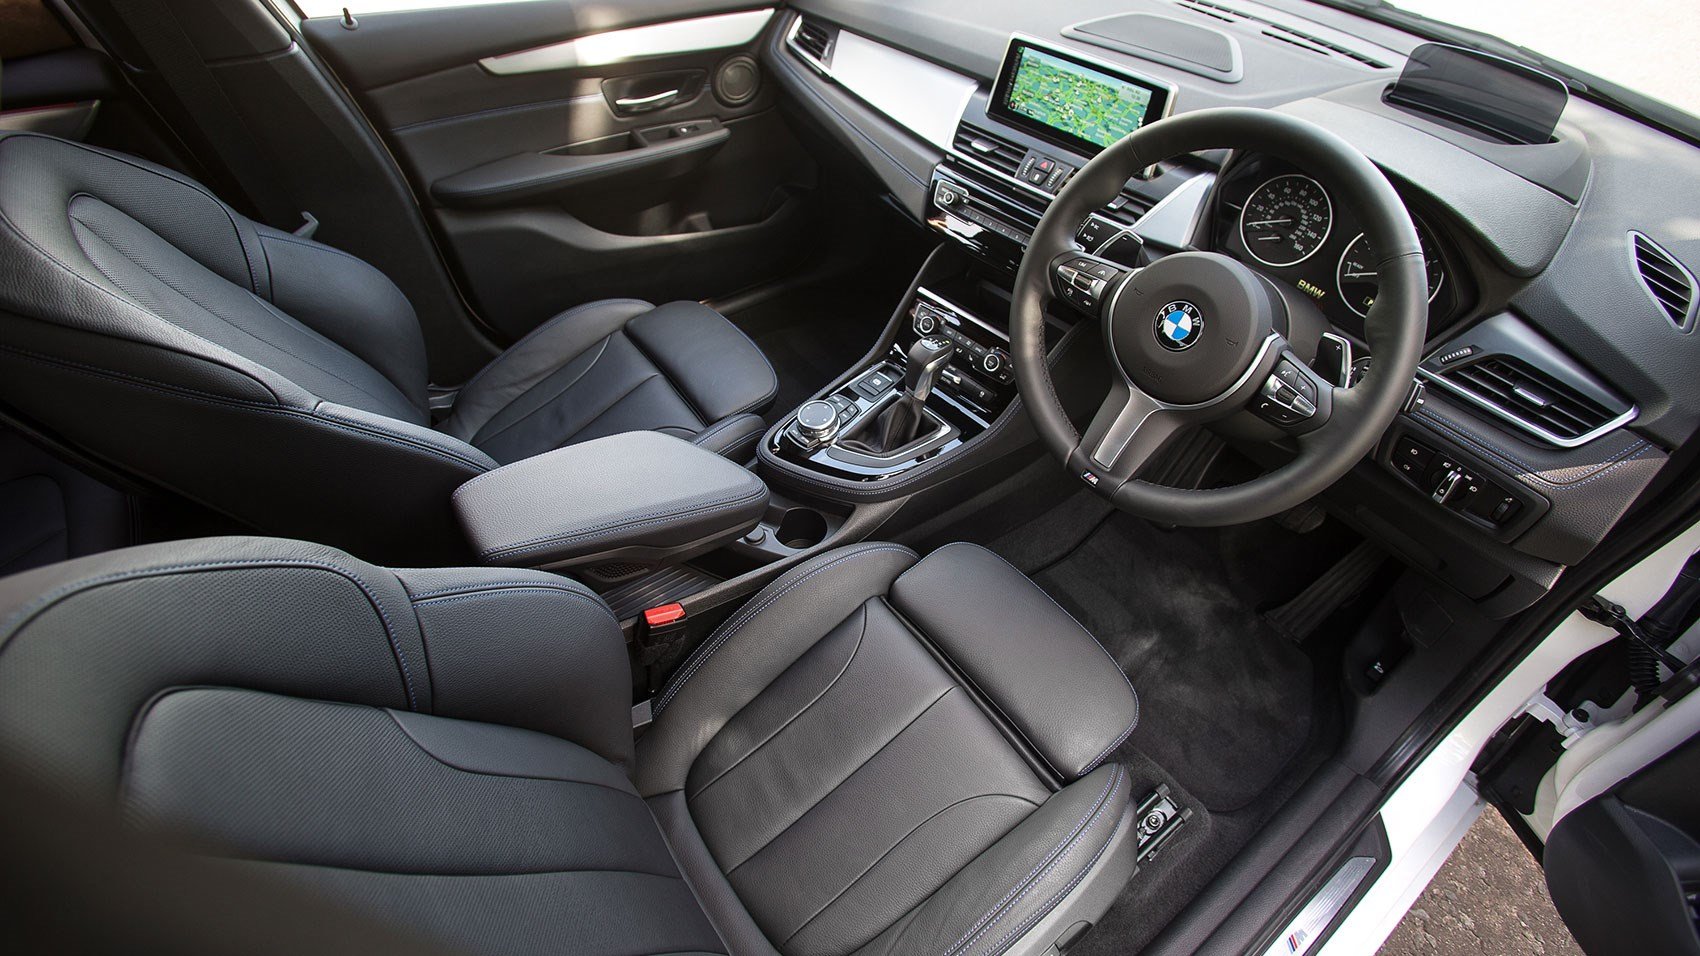 Interior Fit Finish And Materials Impress